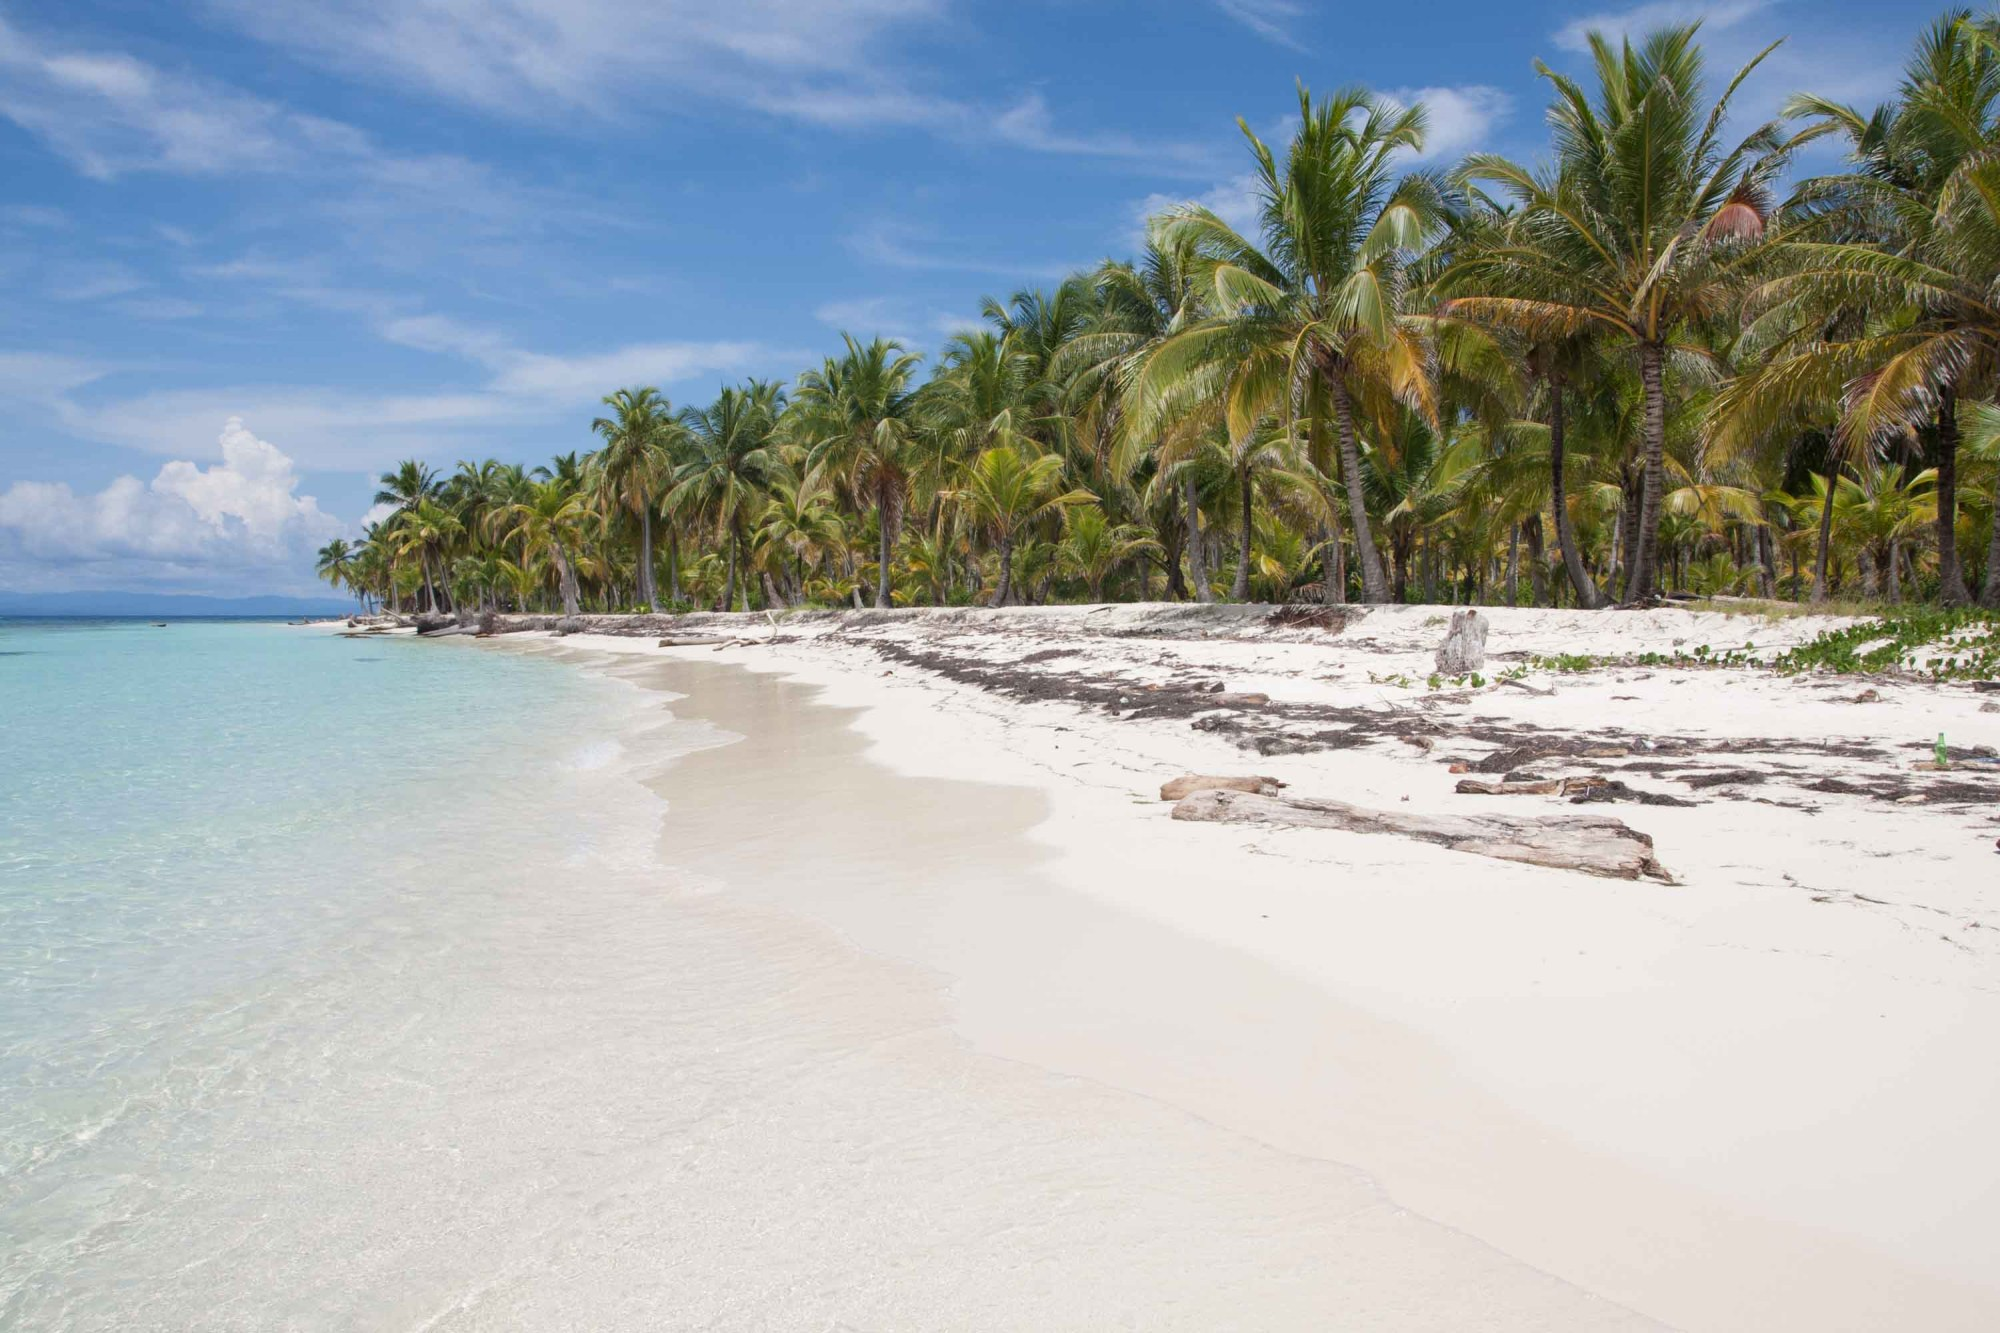 Isla Perro Grande, archipiélago de Guna Yala o San Blas, Panamá